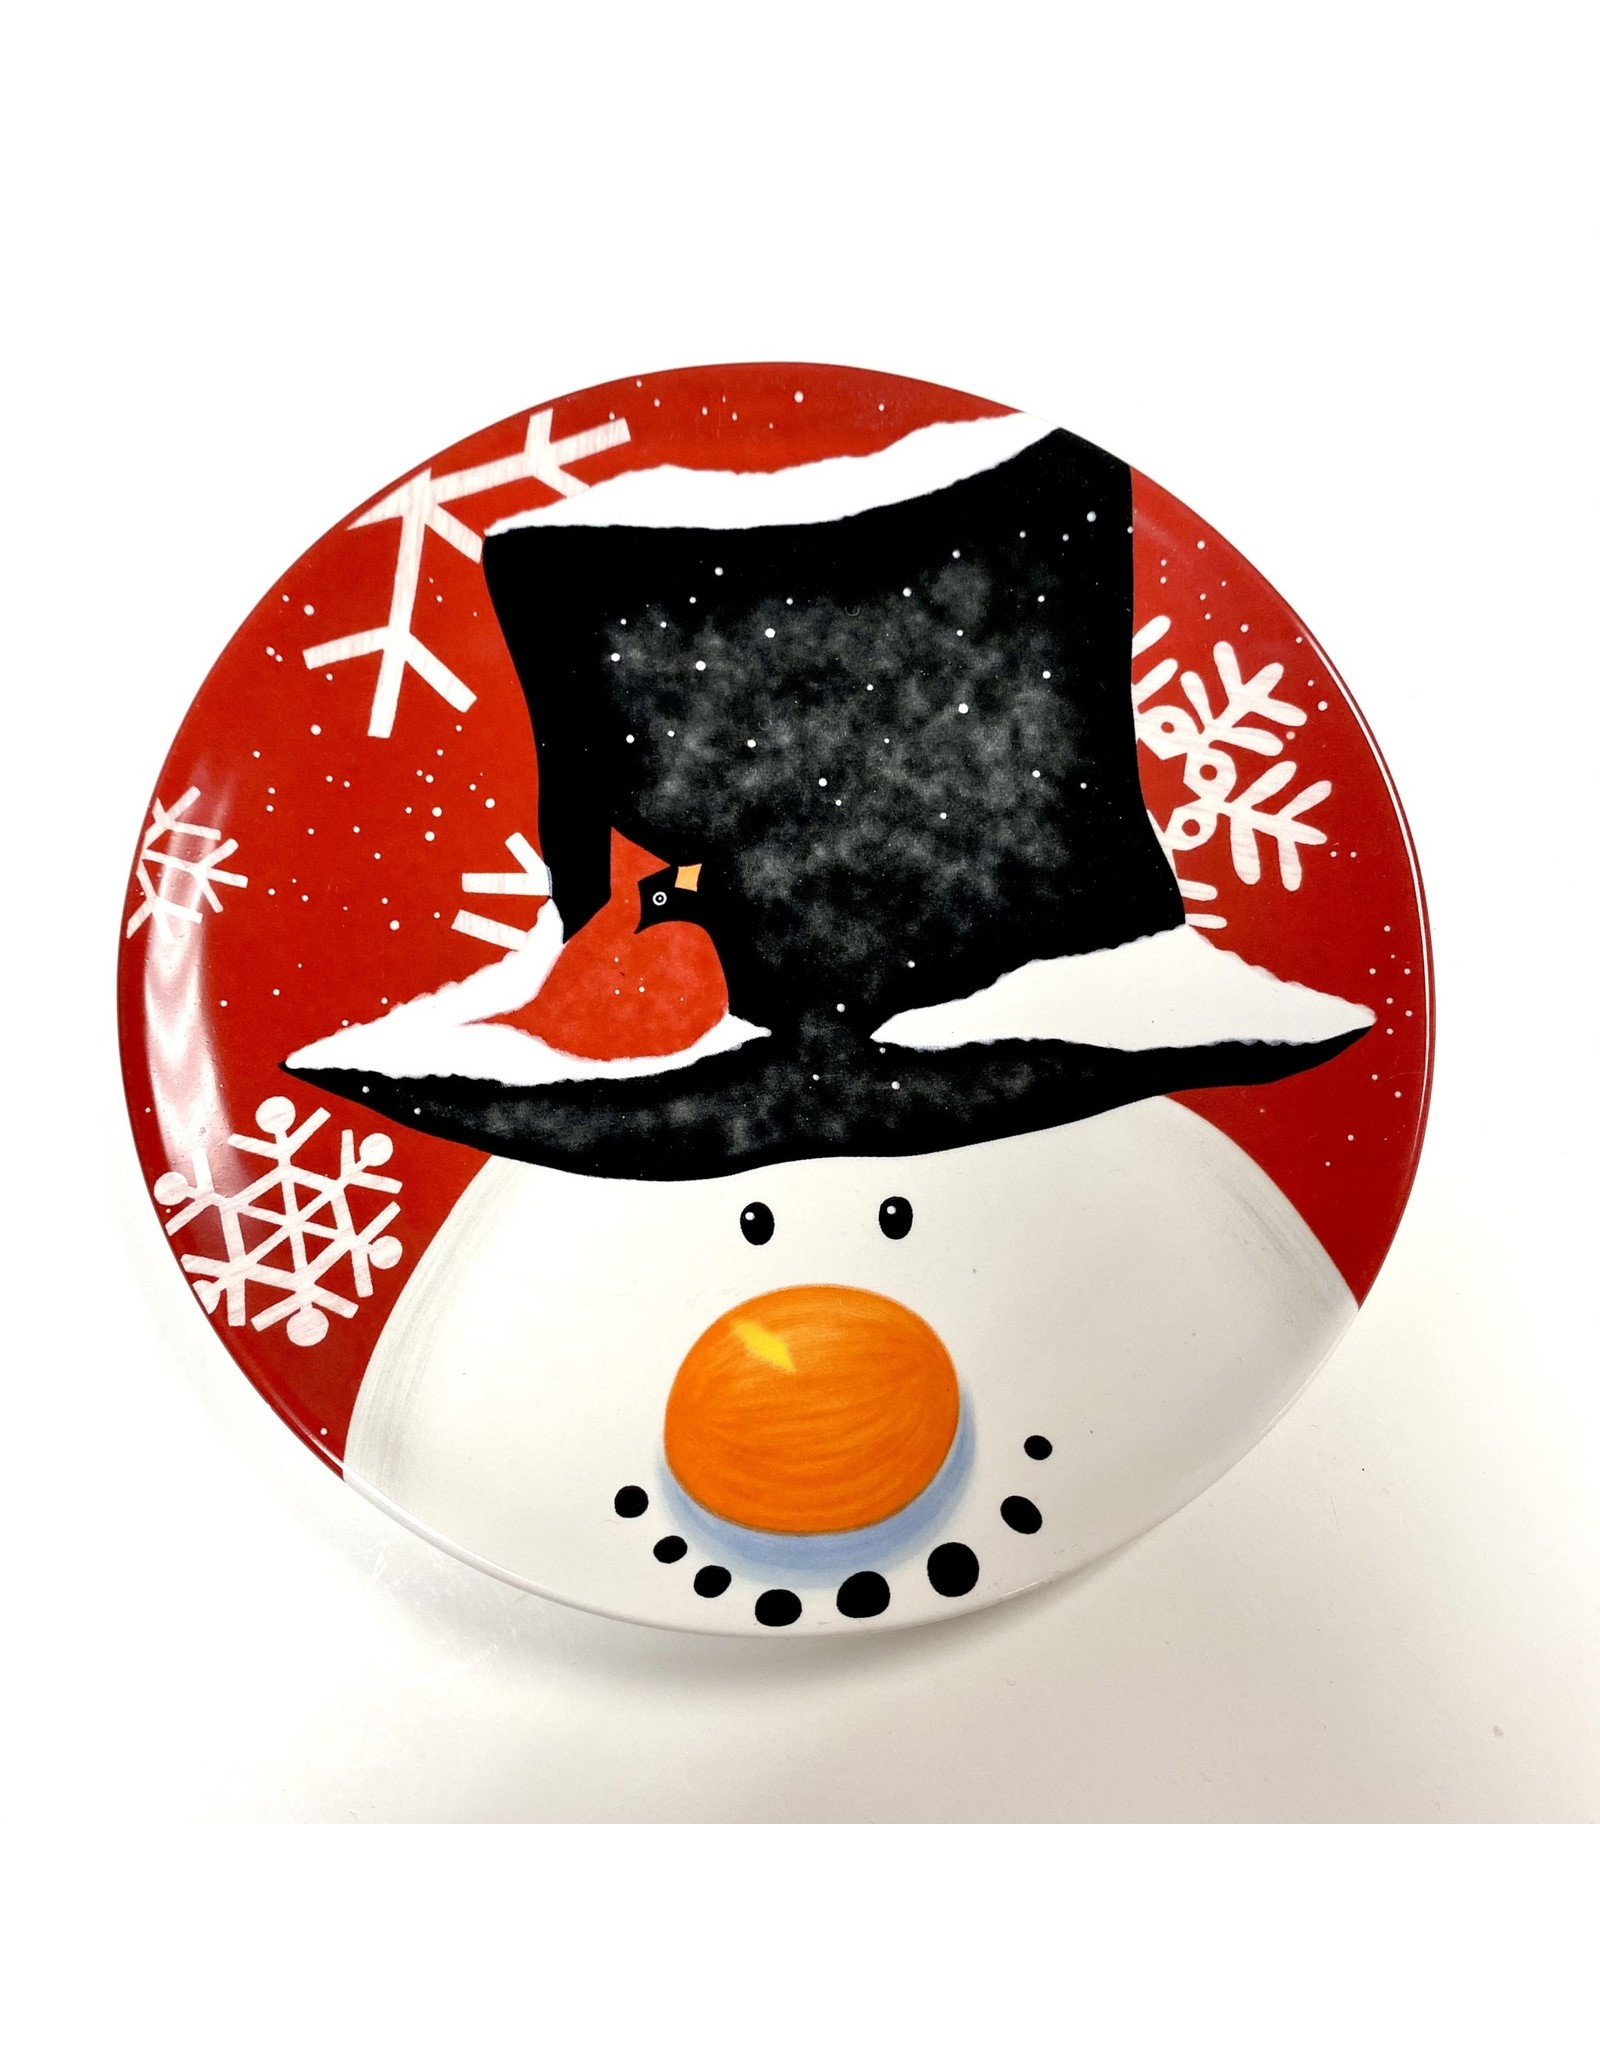 Small snowman plate